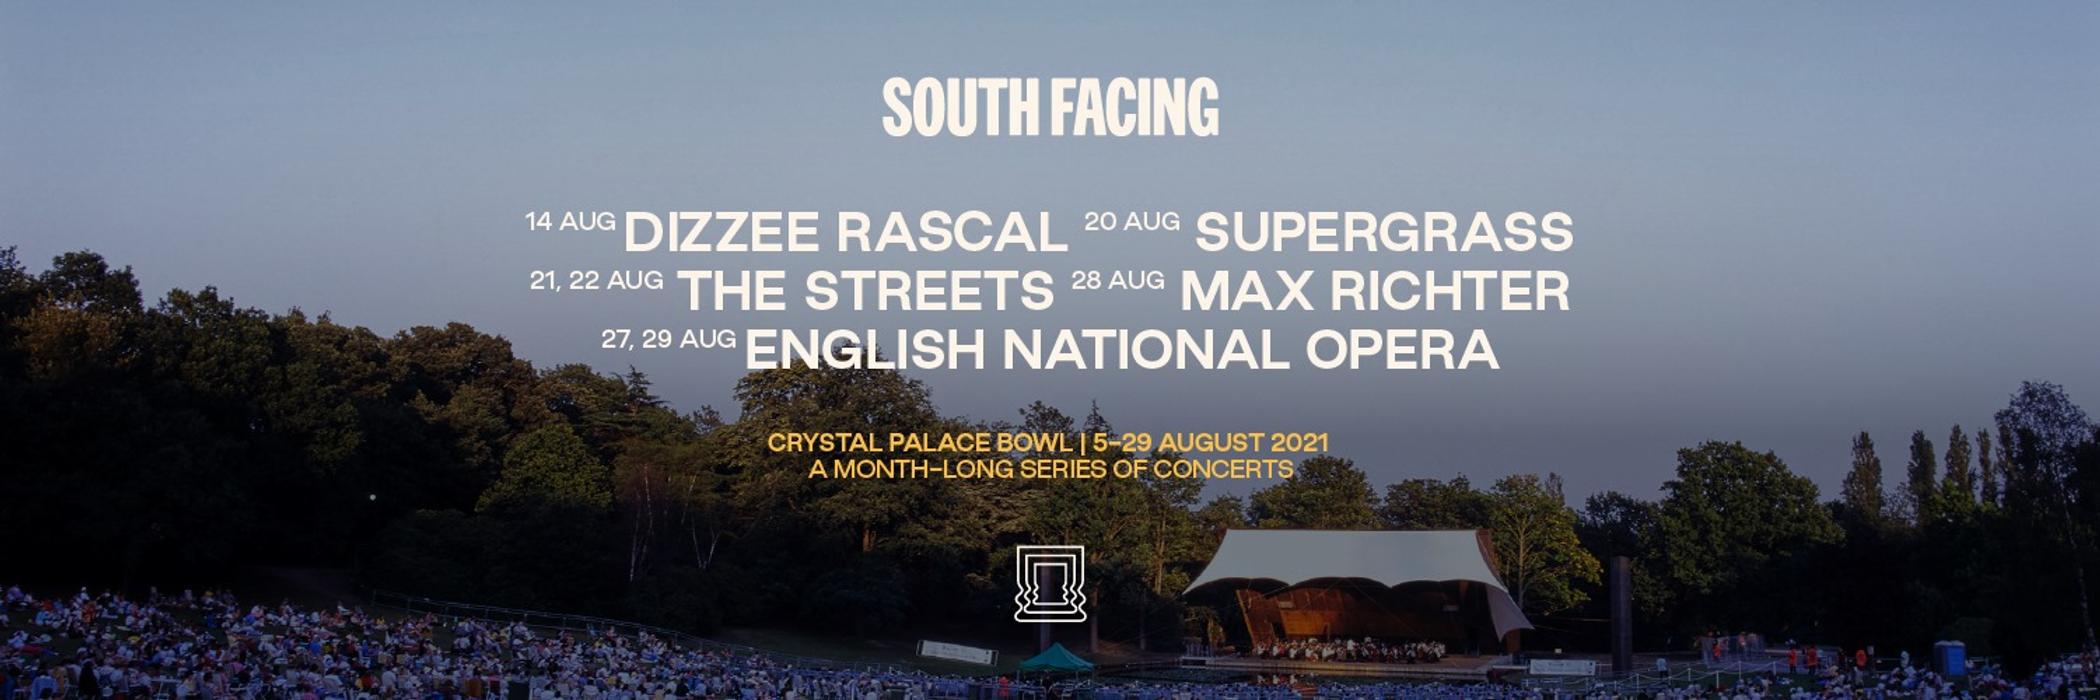 South Facing Festival's event image